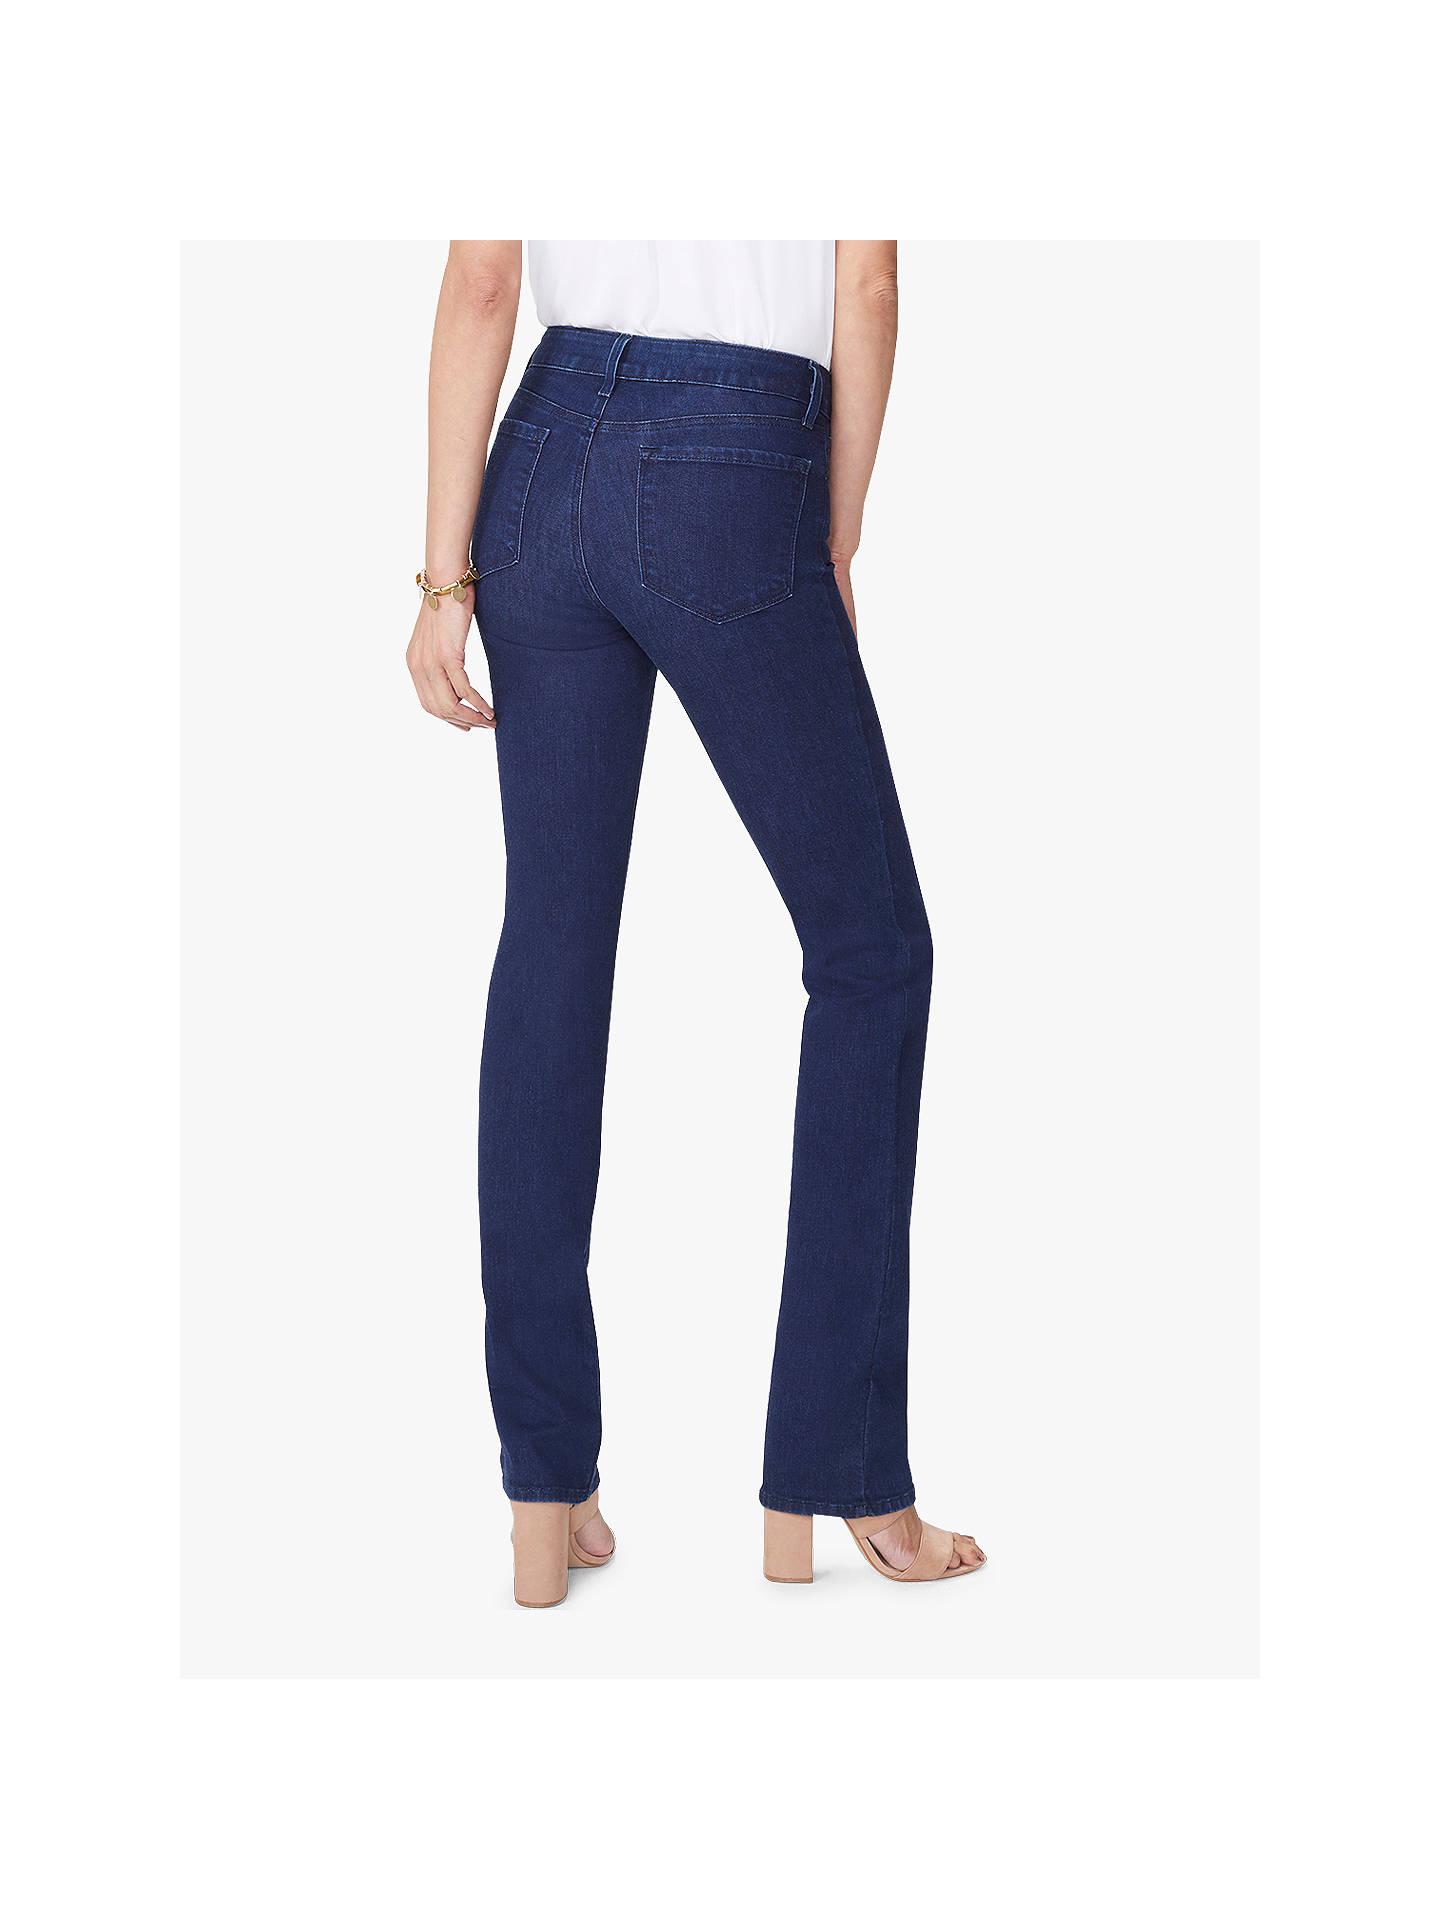 d6ba9b62b3d Buy NYDJ Marilyn Straight Leg High Waist Jeans